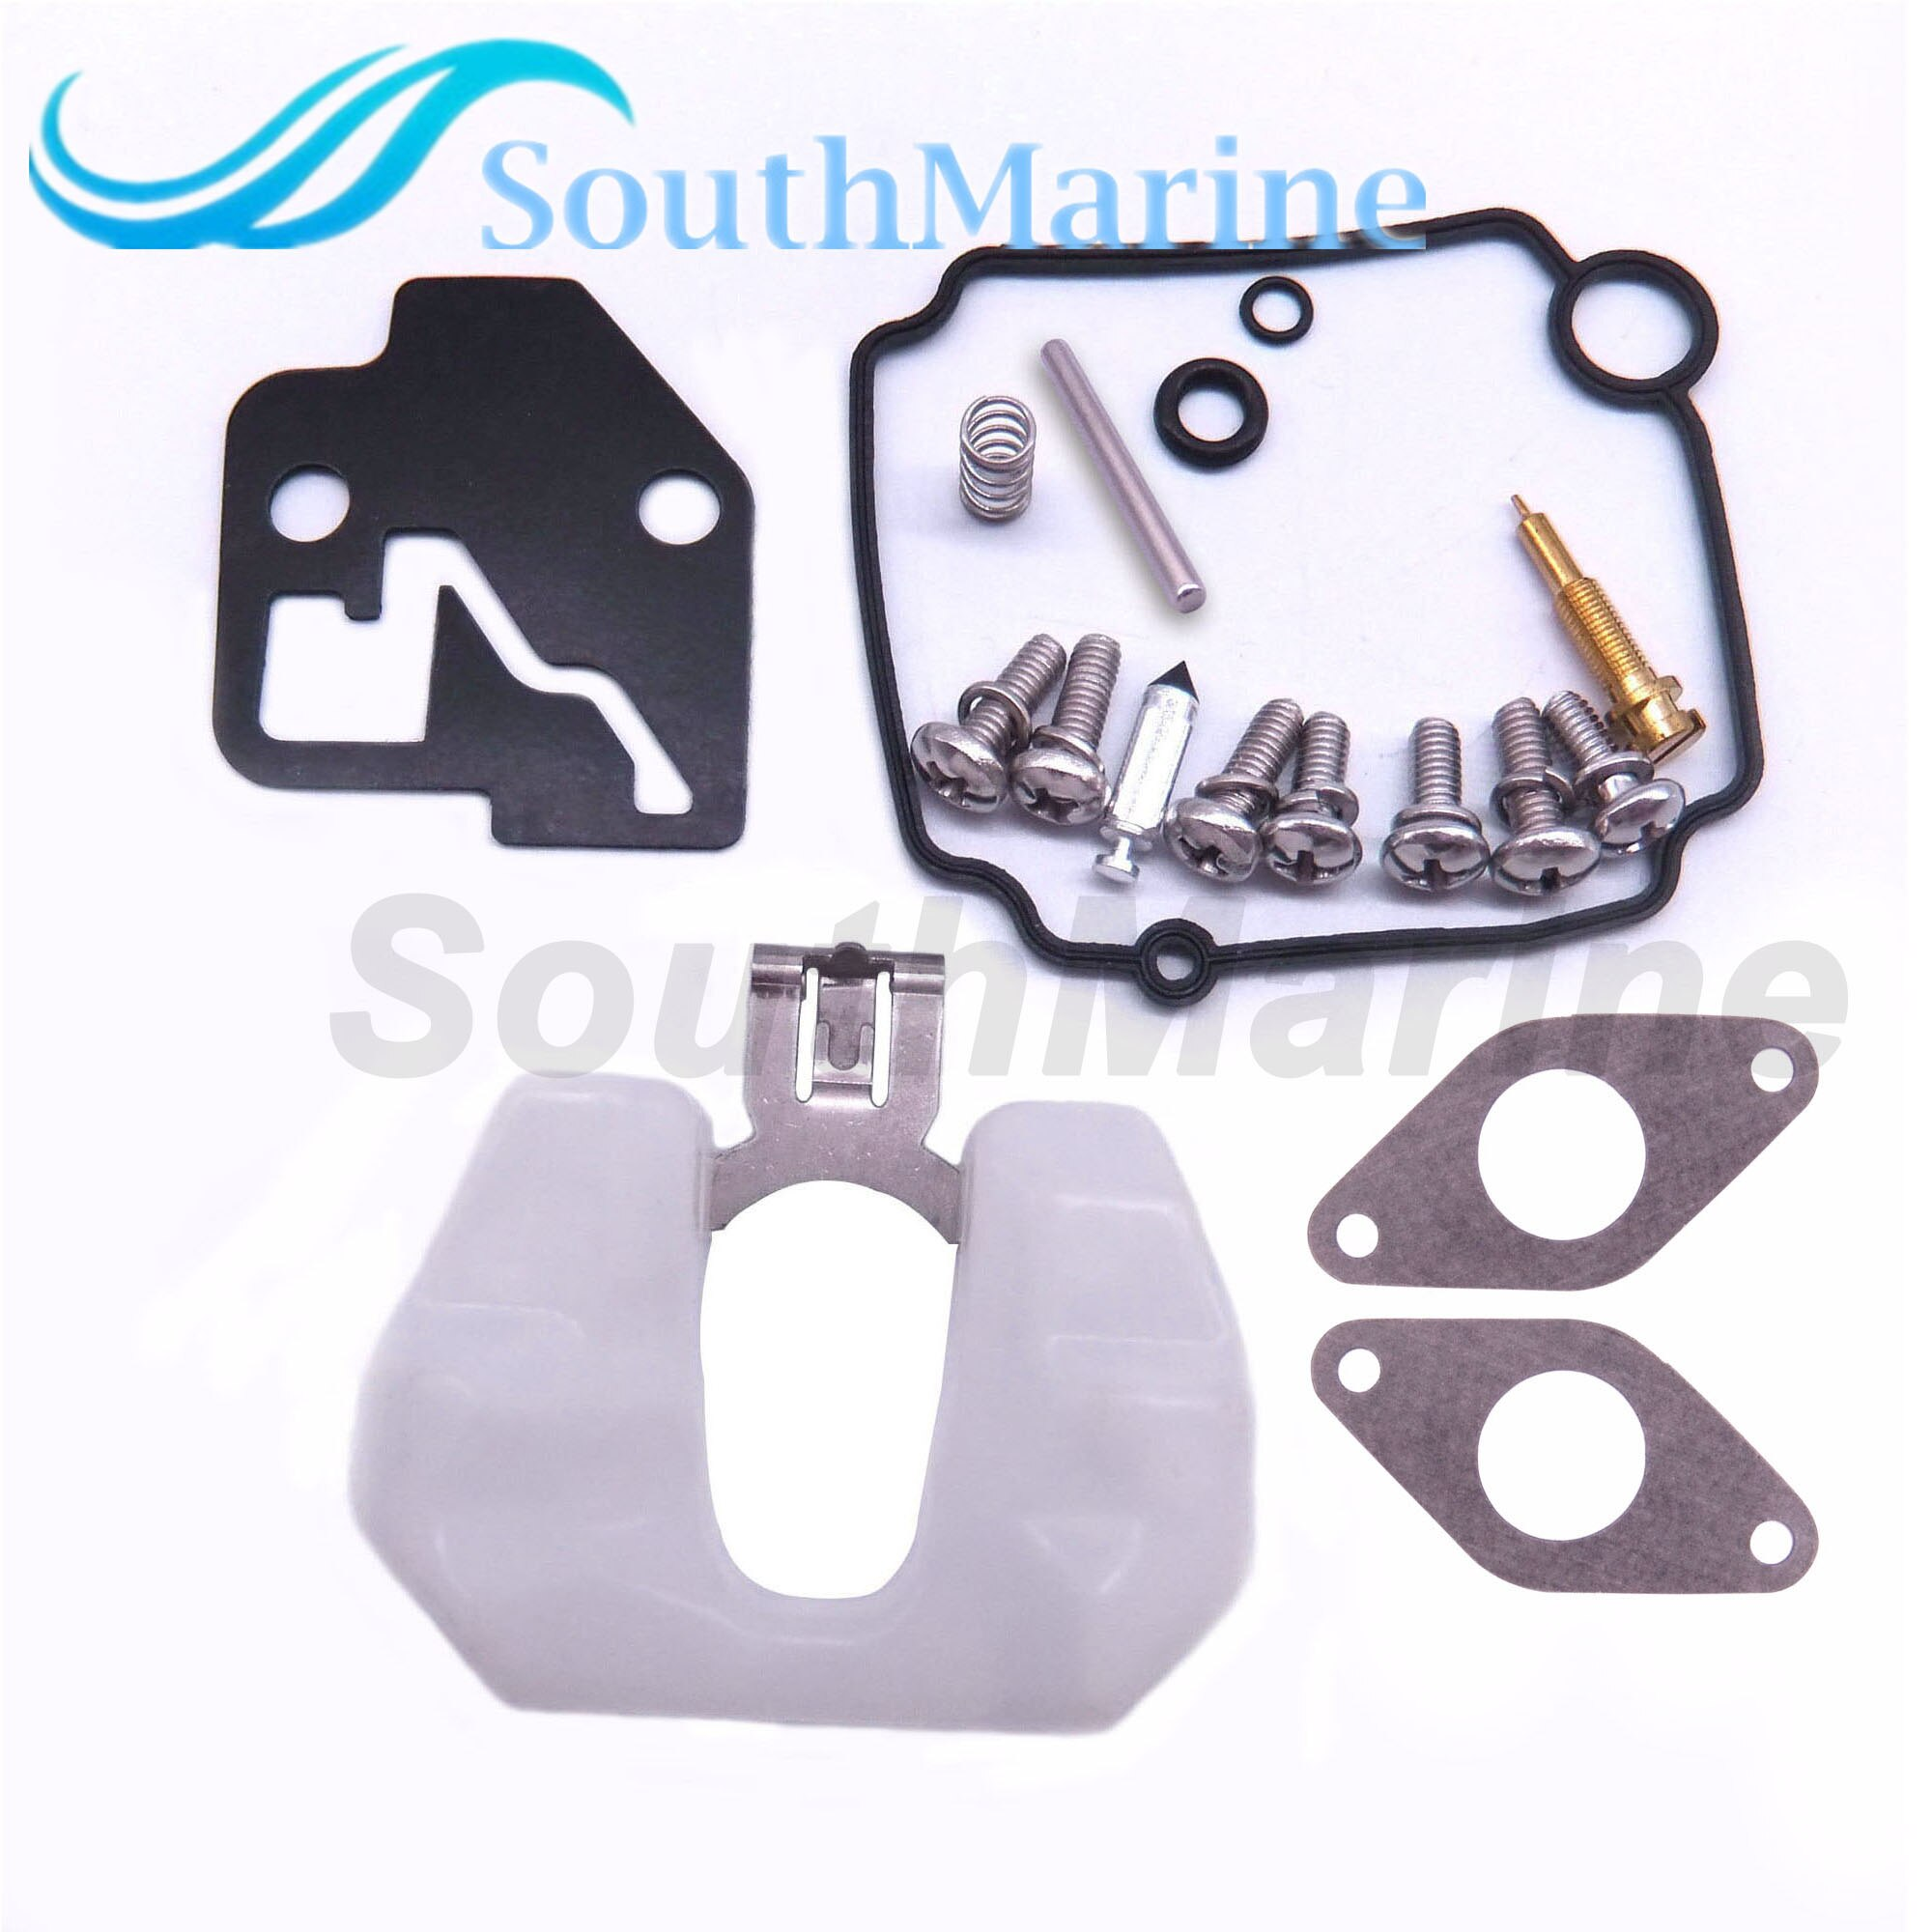 8M0044576 Carburetor Repair Kit for Mercury Mercruiser Quicksilver Outboard Engine 8HP 9.9HP